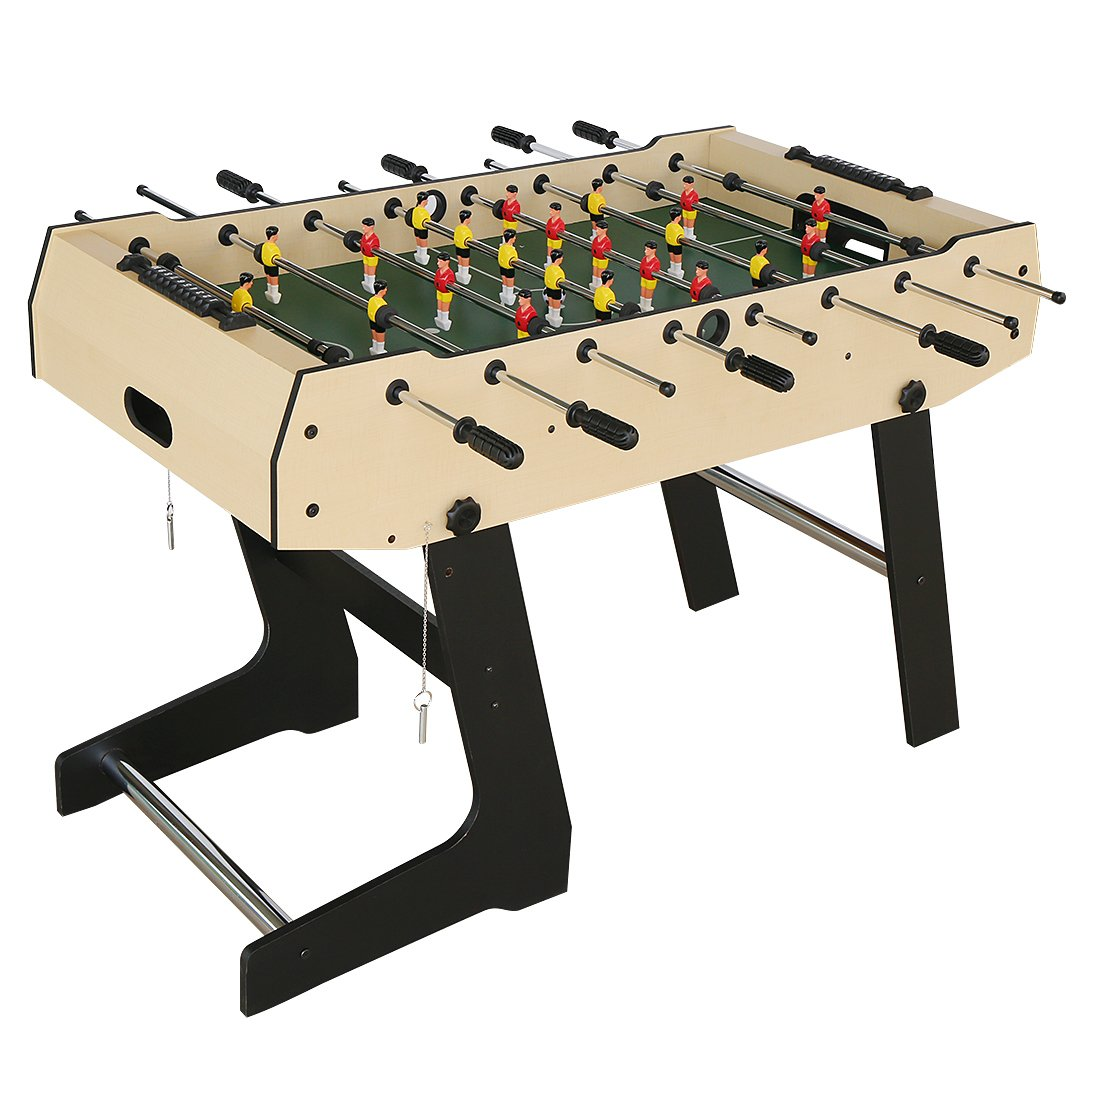 HLC 4ft Folding Foosball Table